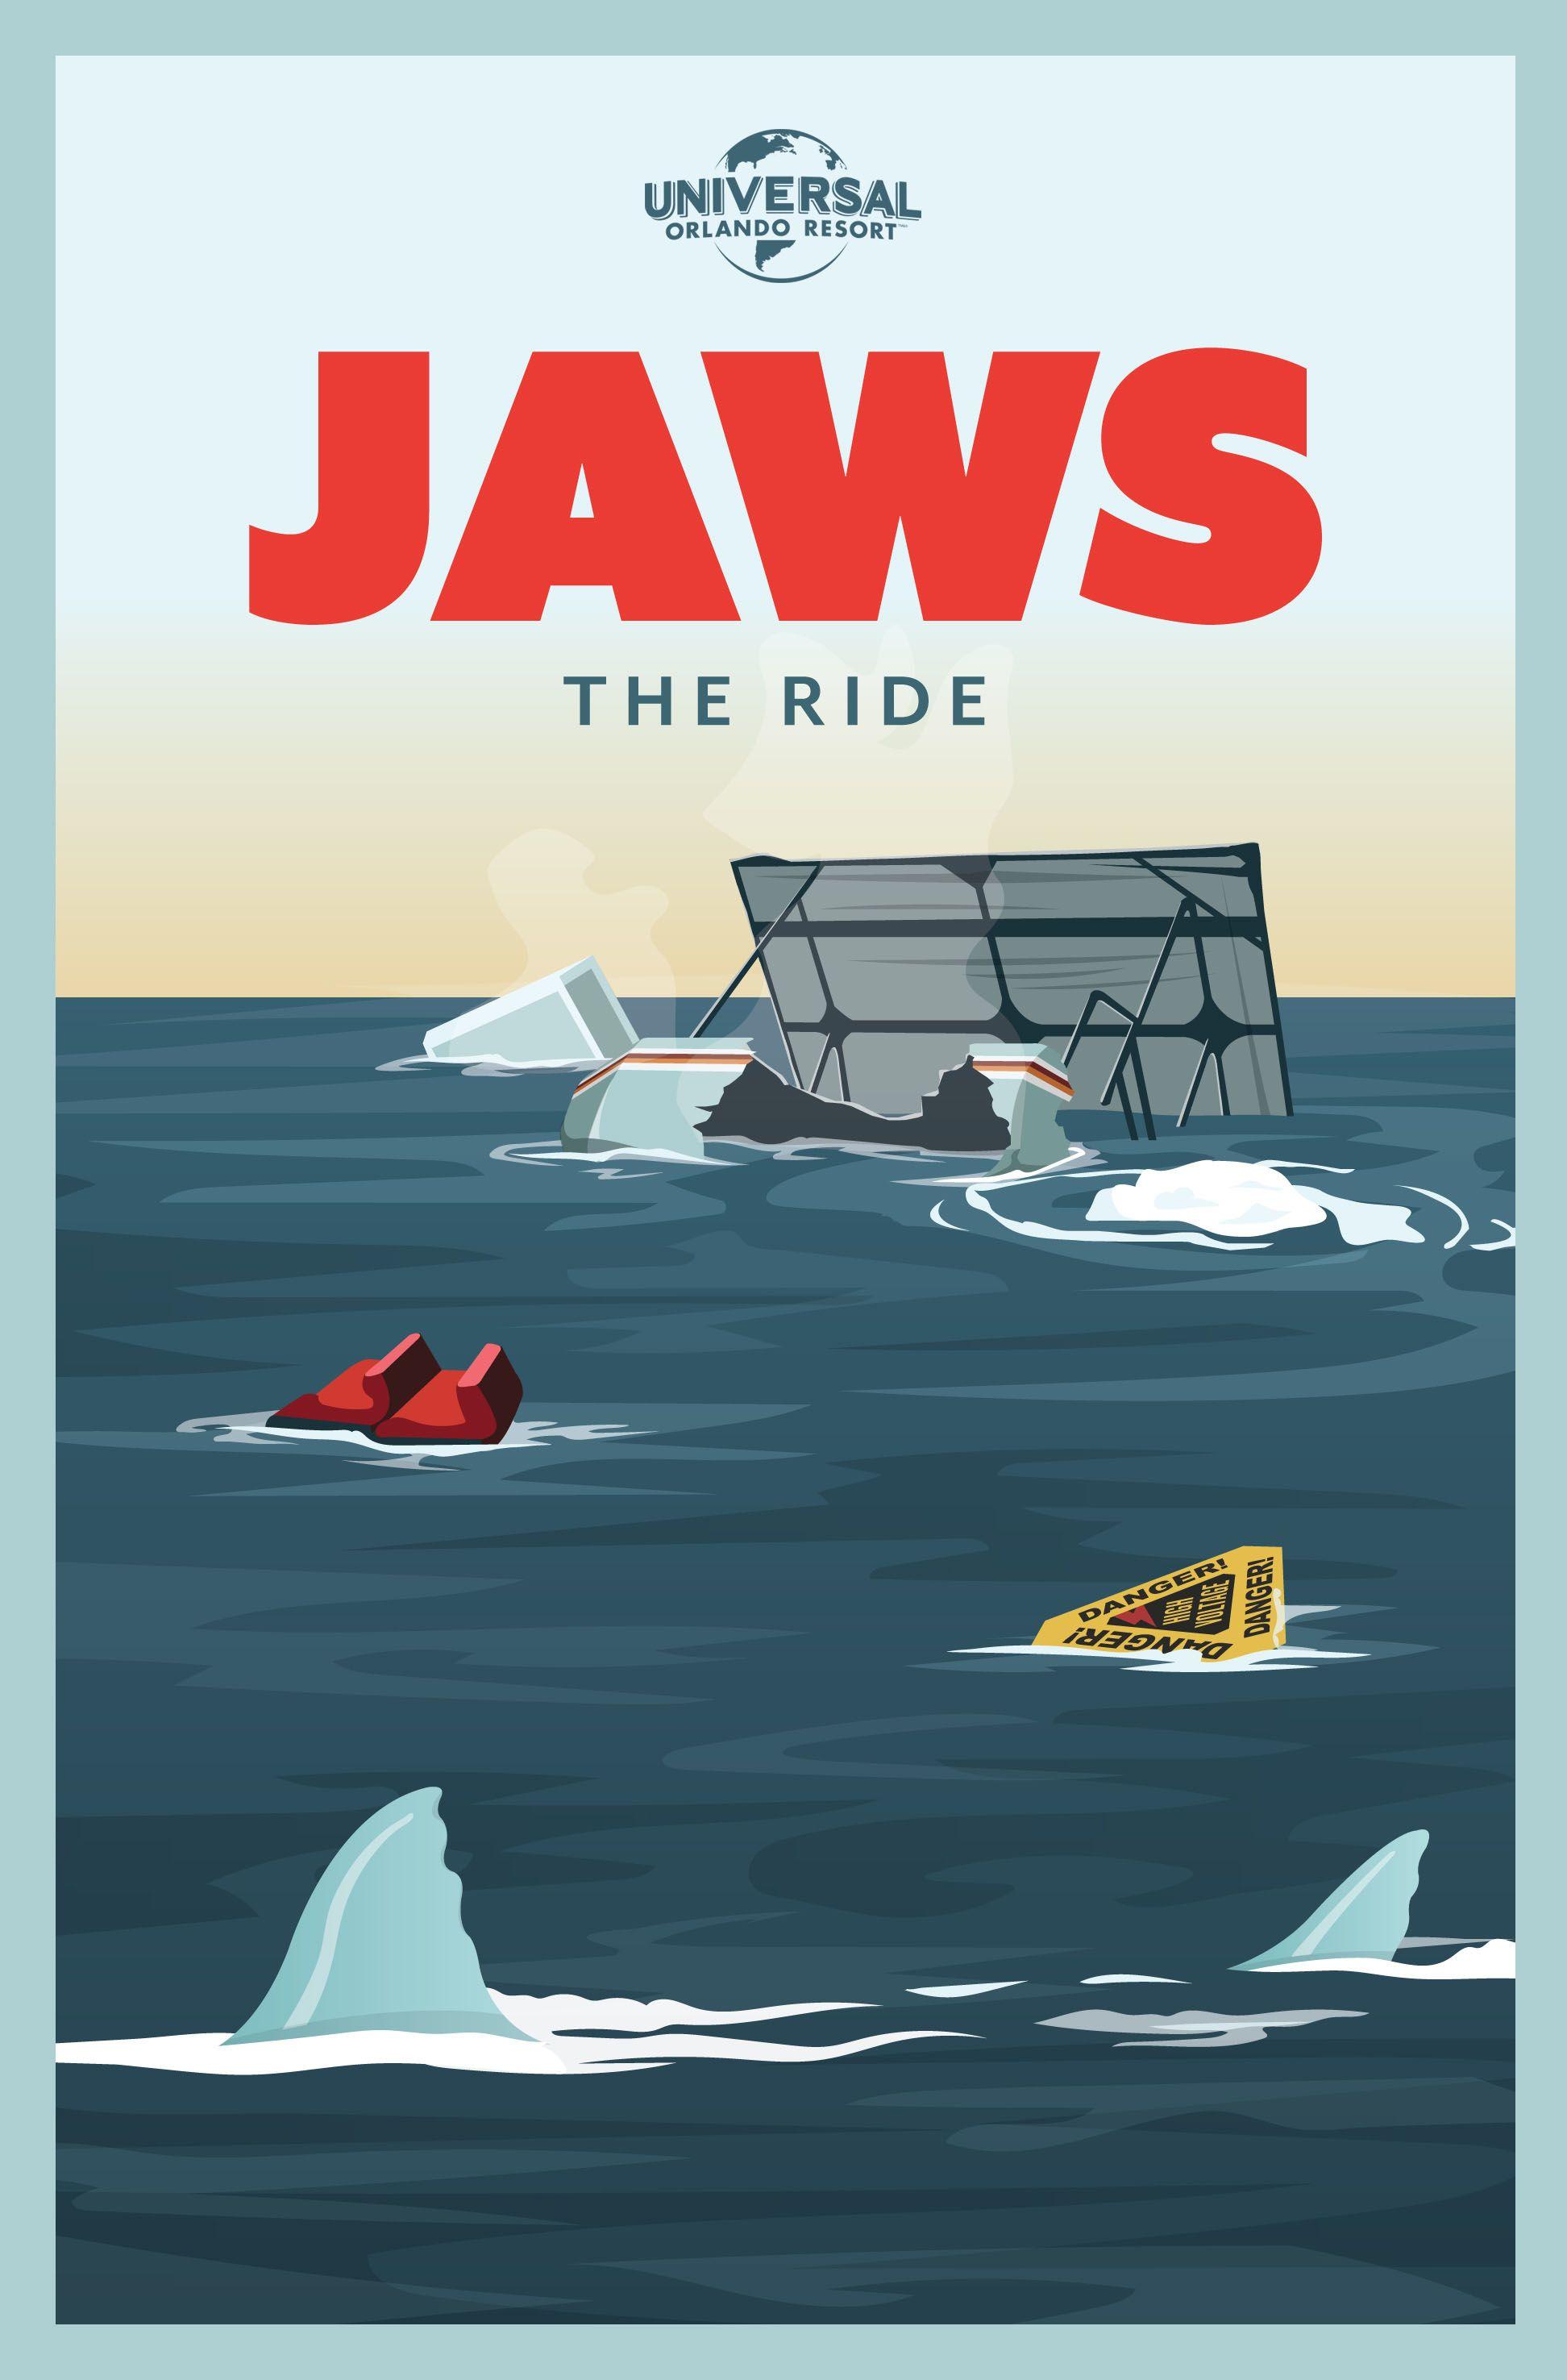 Retro Jaws poster